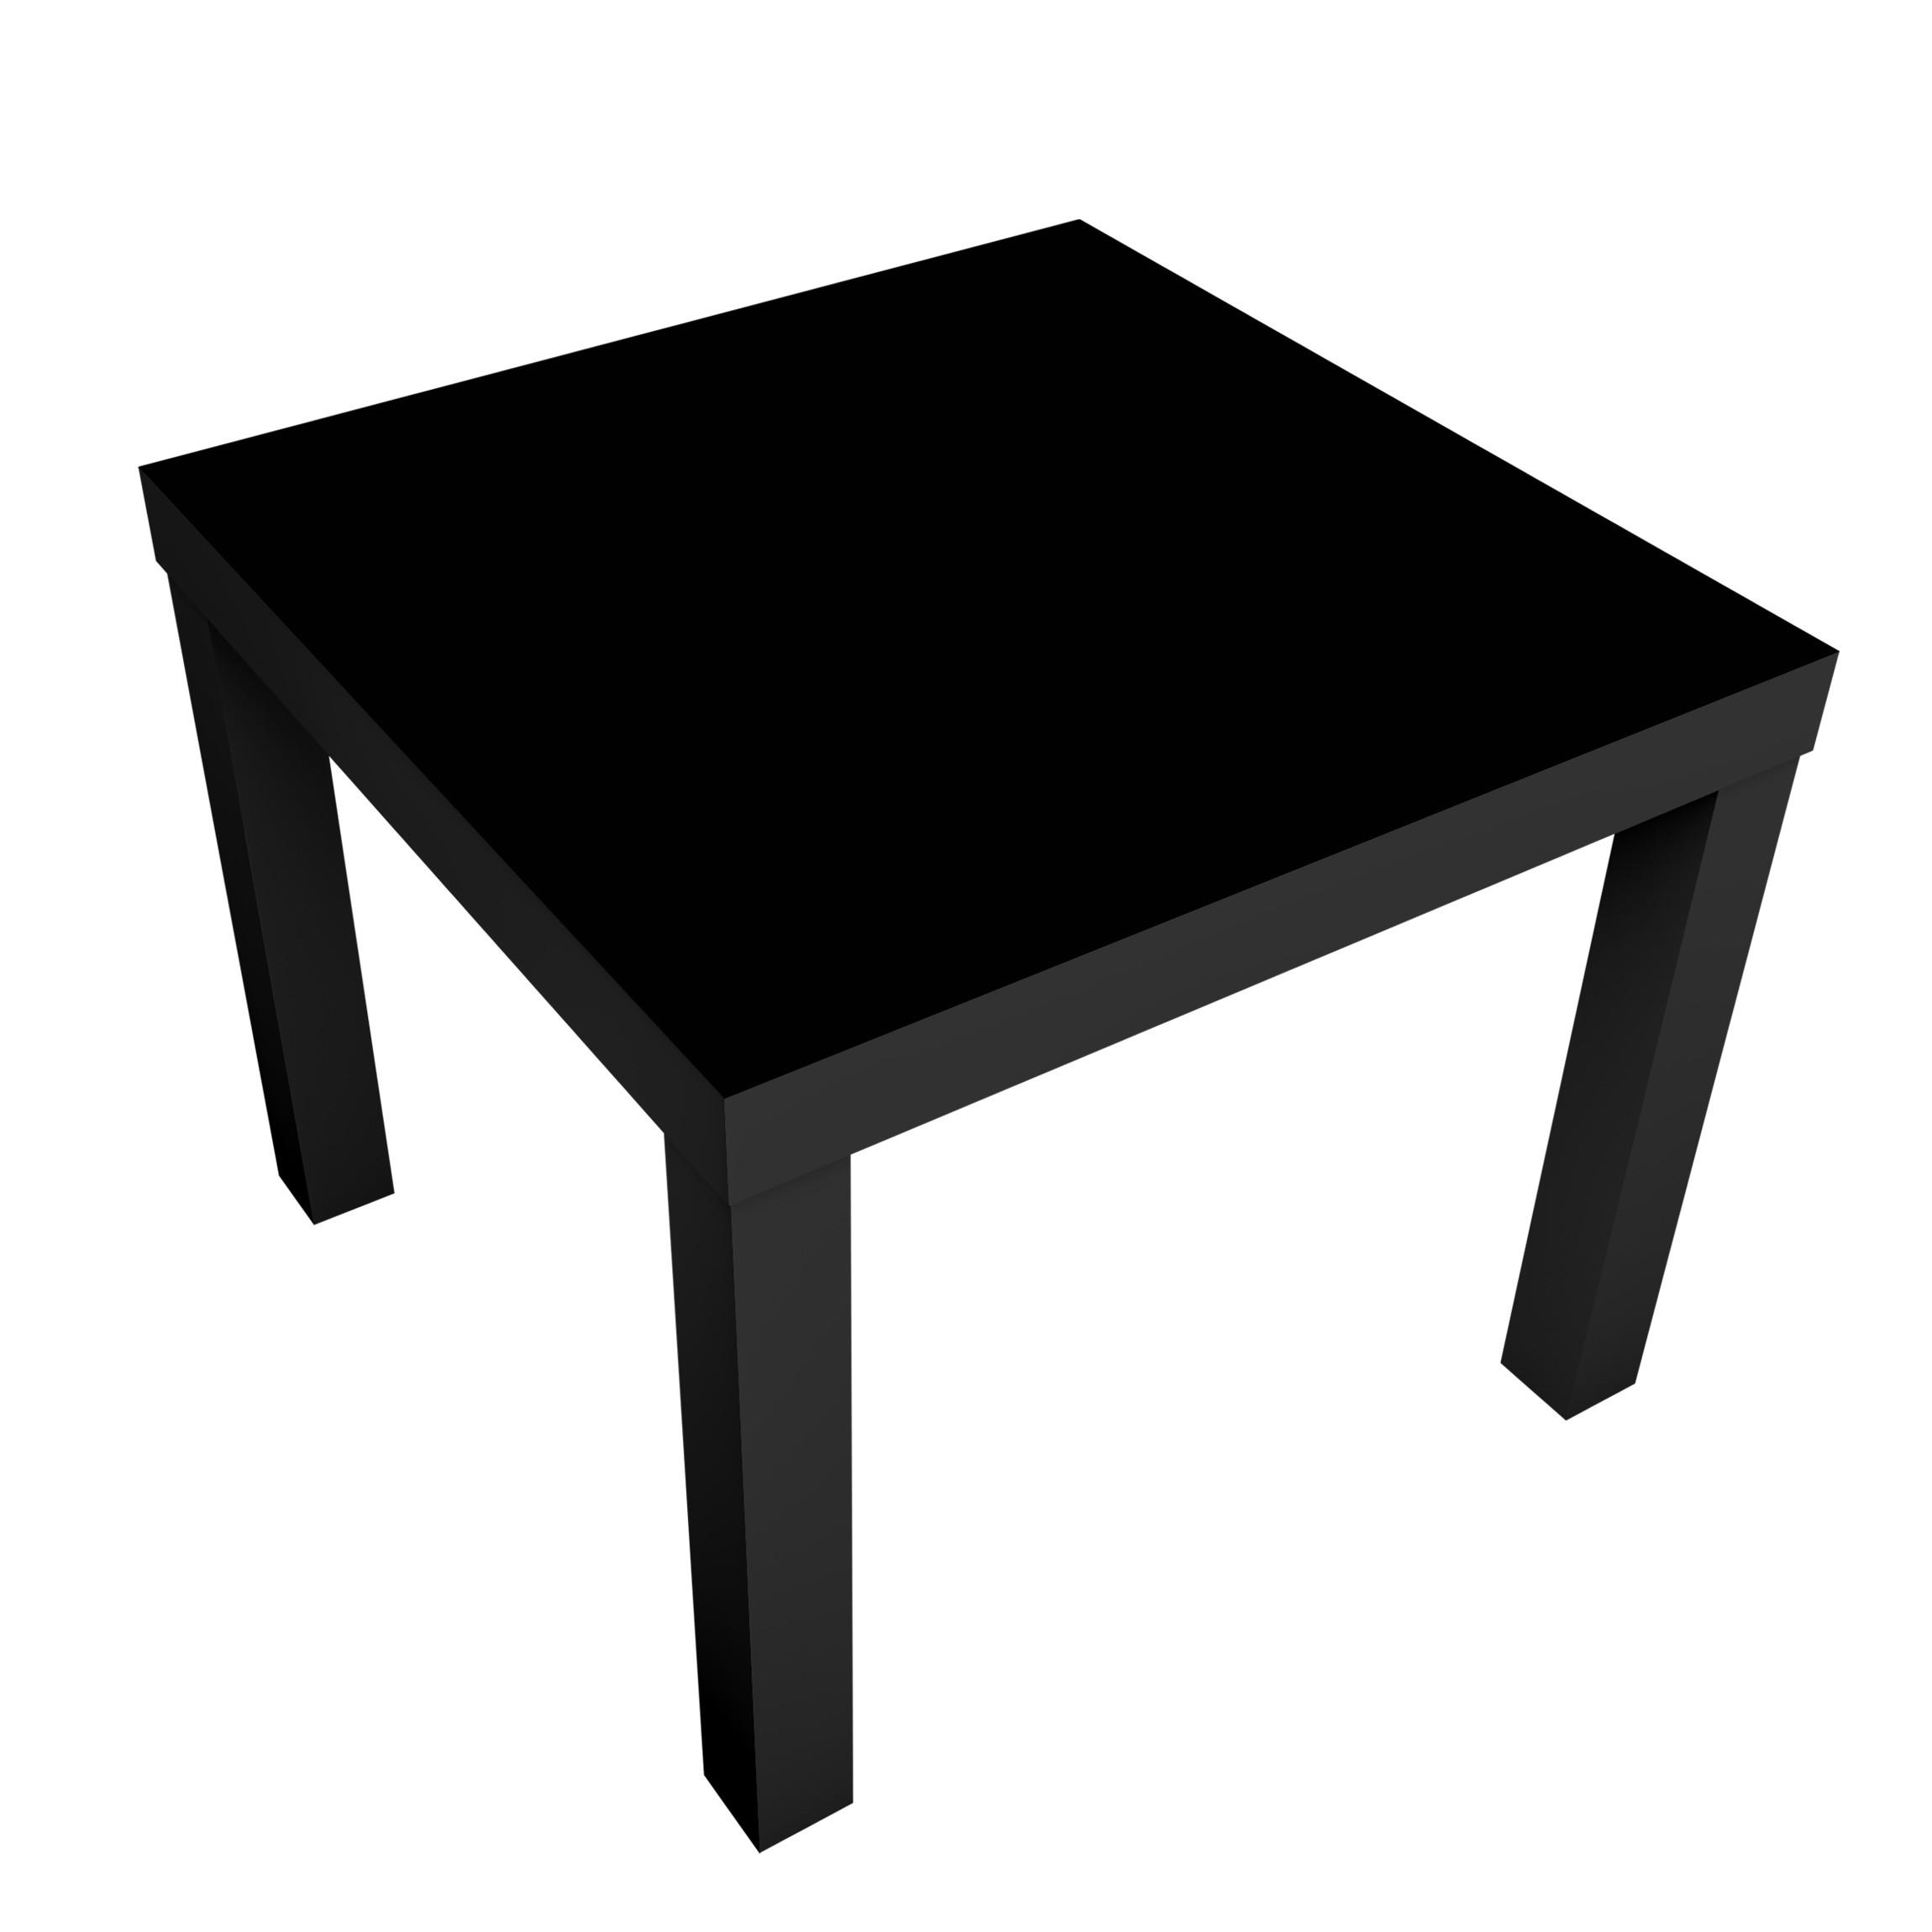 Carta adesiva per mobili ikea lack tavolino colour black - Ikea lack tavolino ...